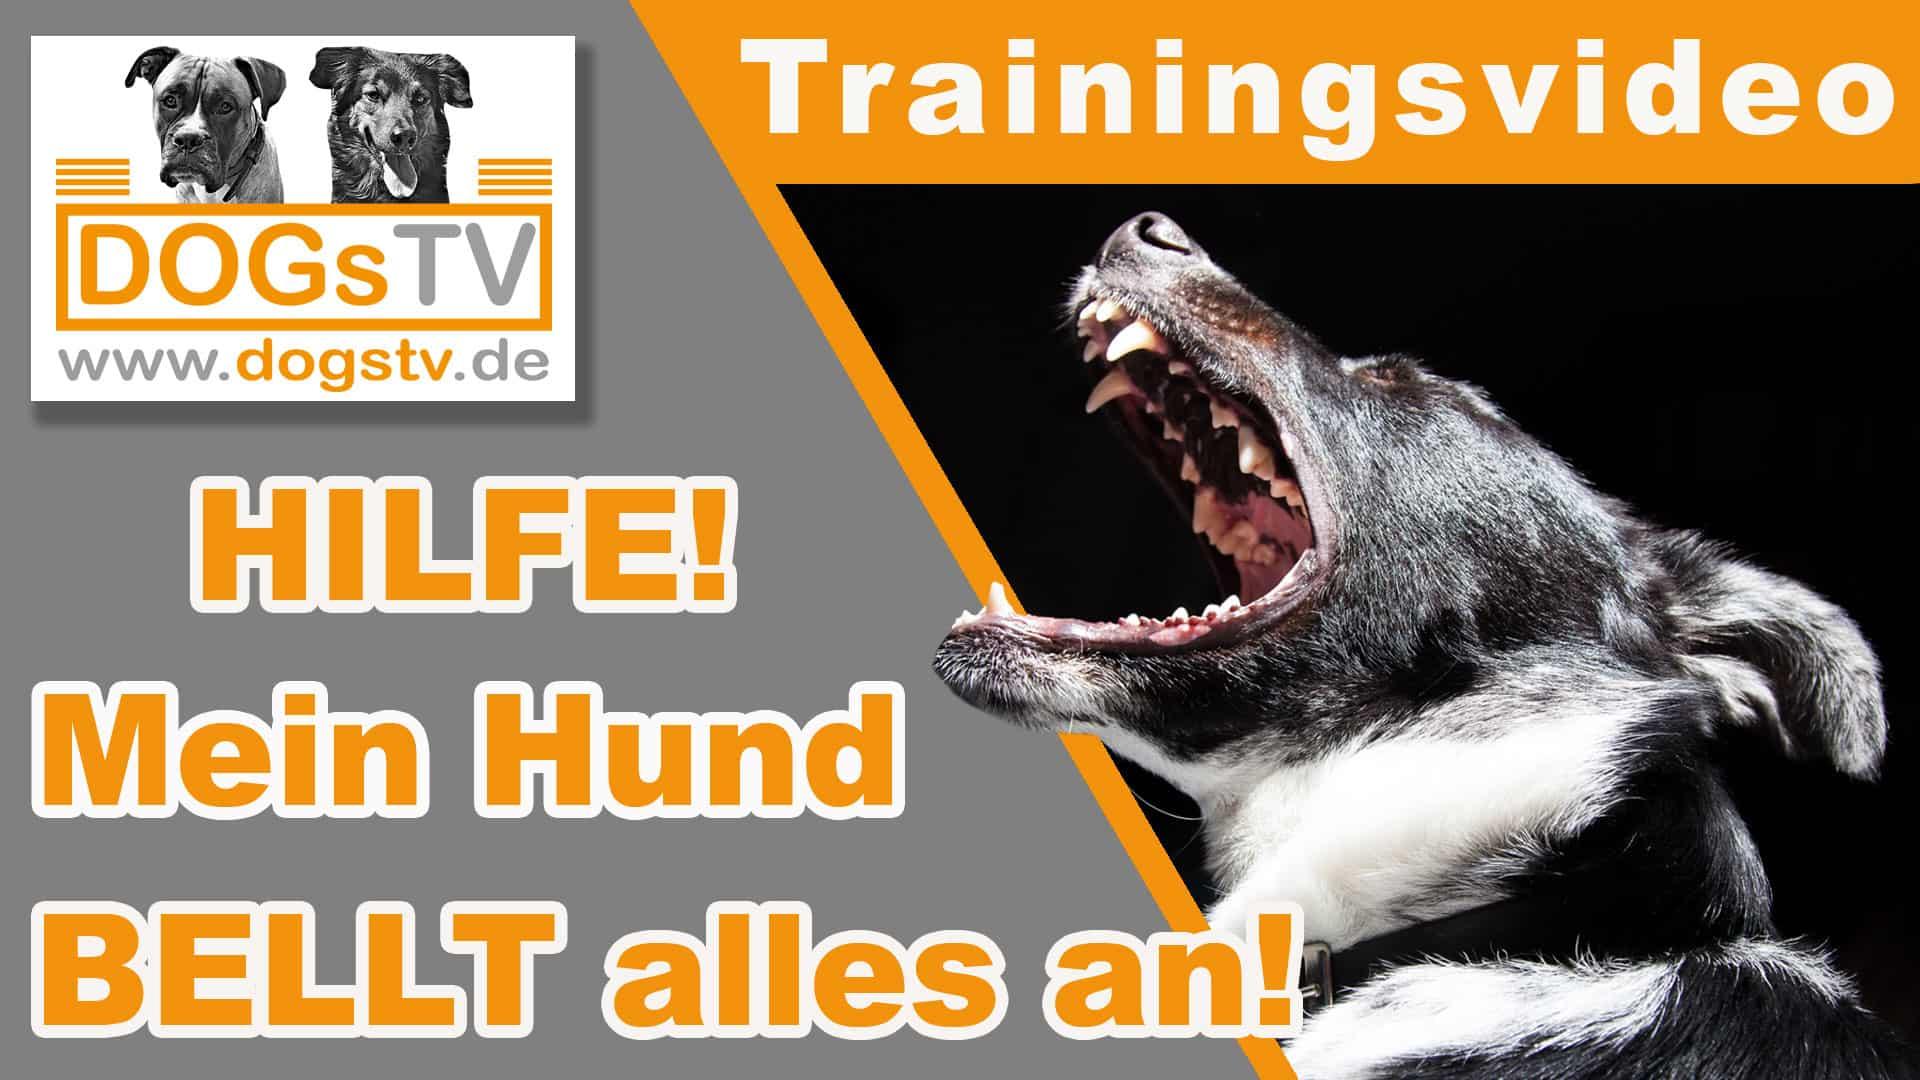 leinenaggression-hund-bellt-alles-an-dogstv